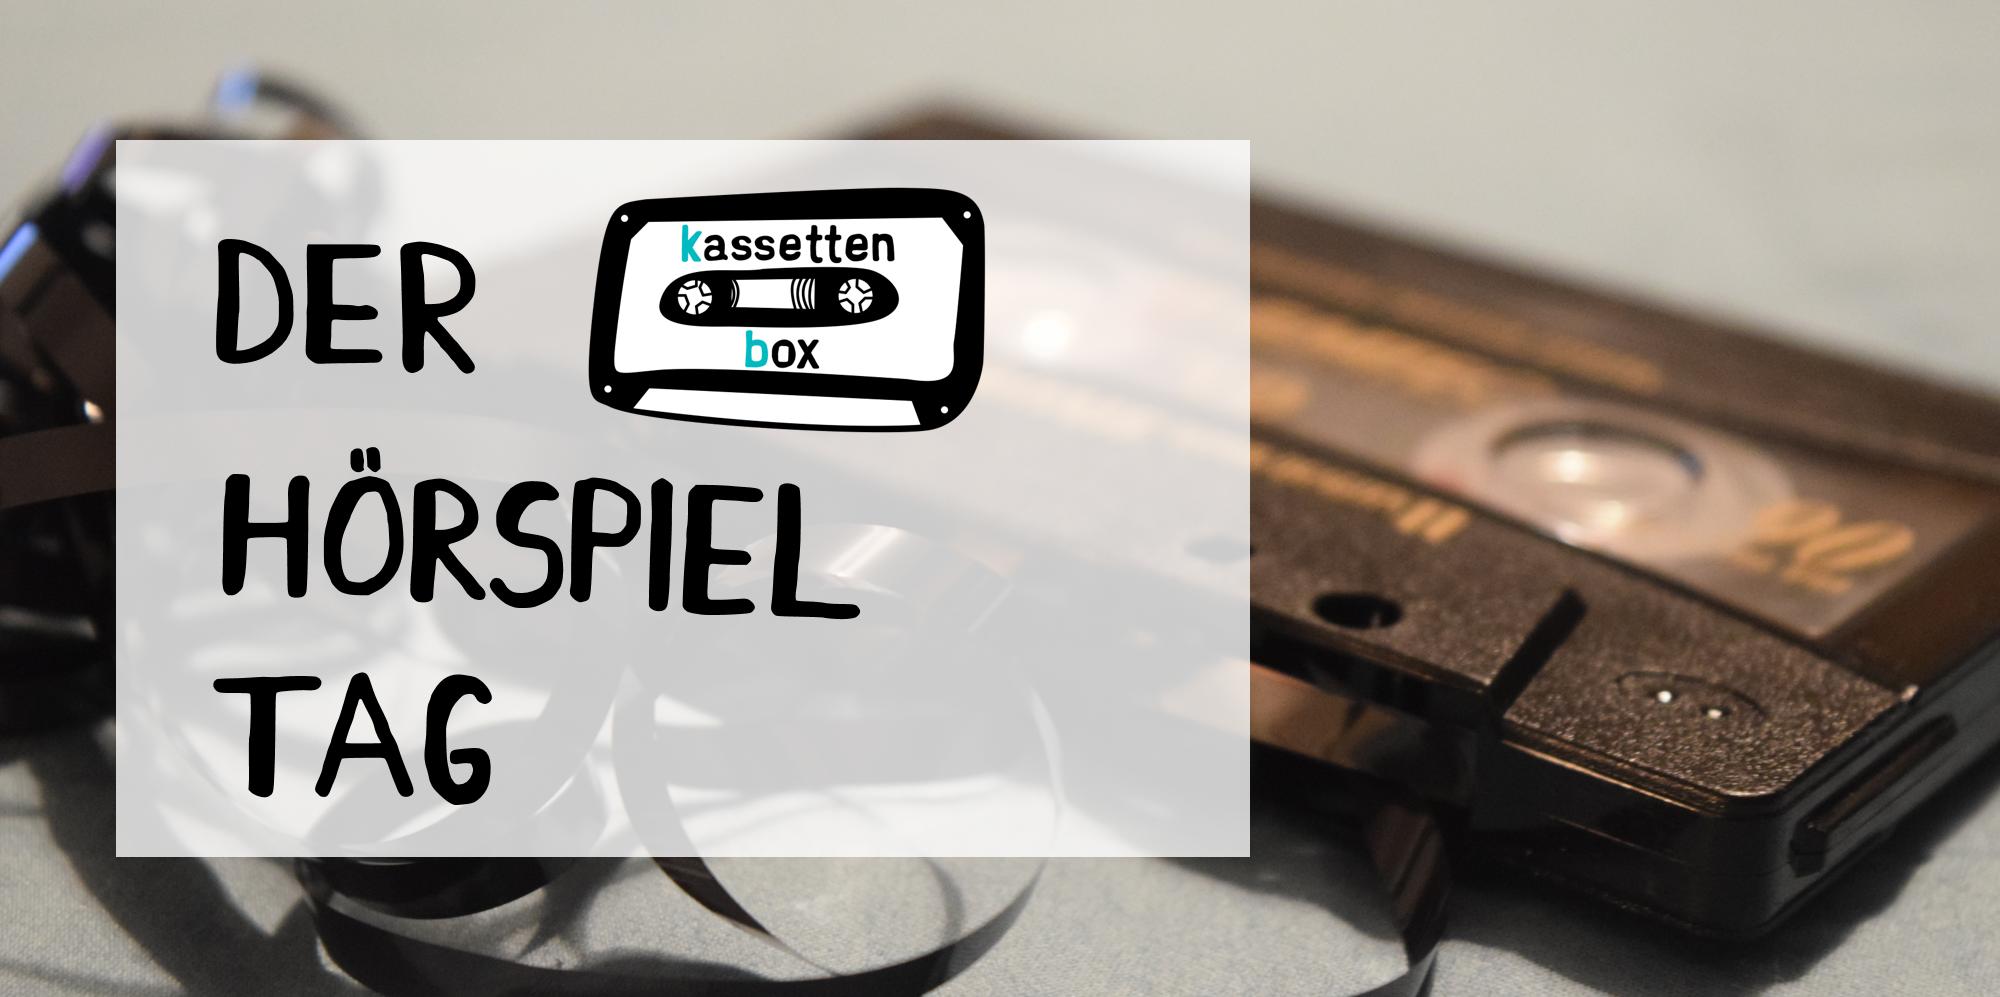 kassettenbox Hörspieltag 2017